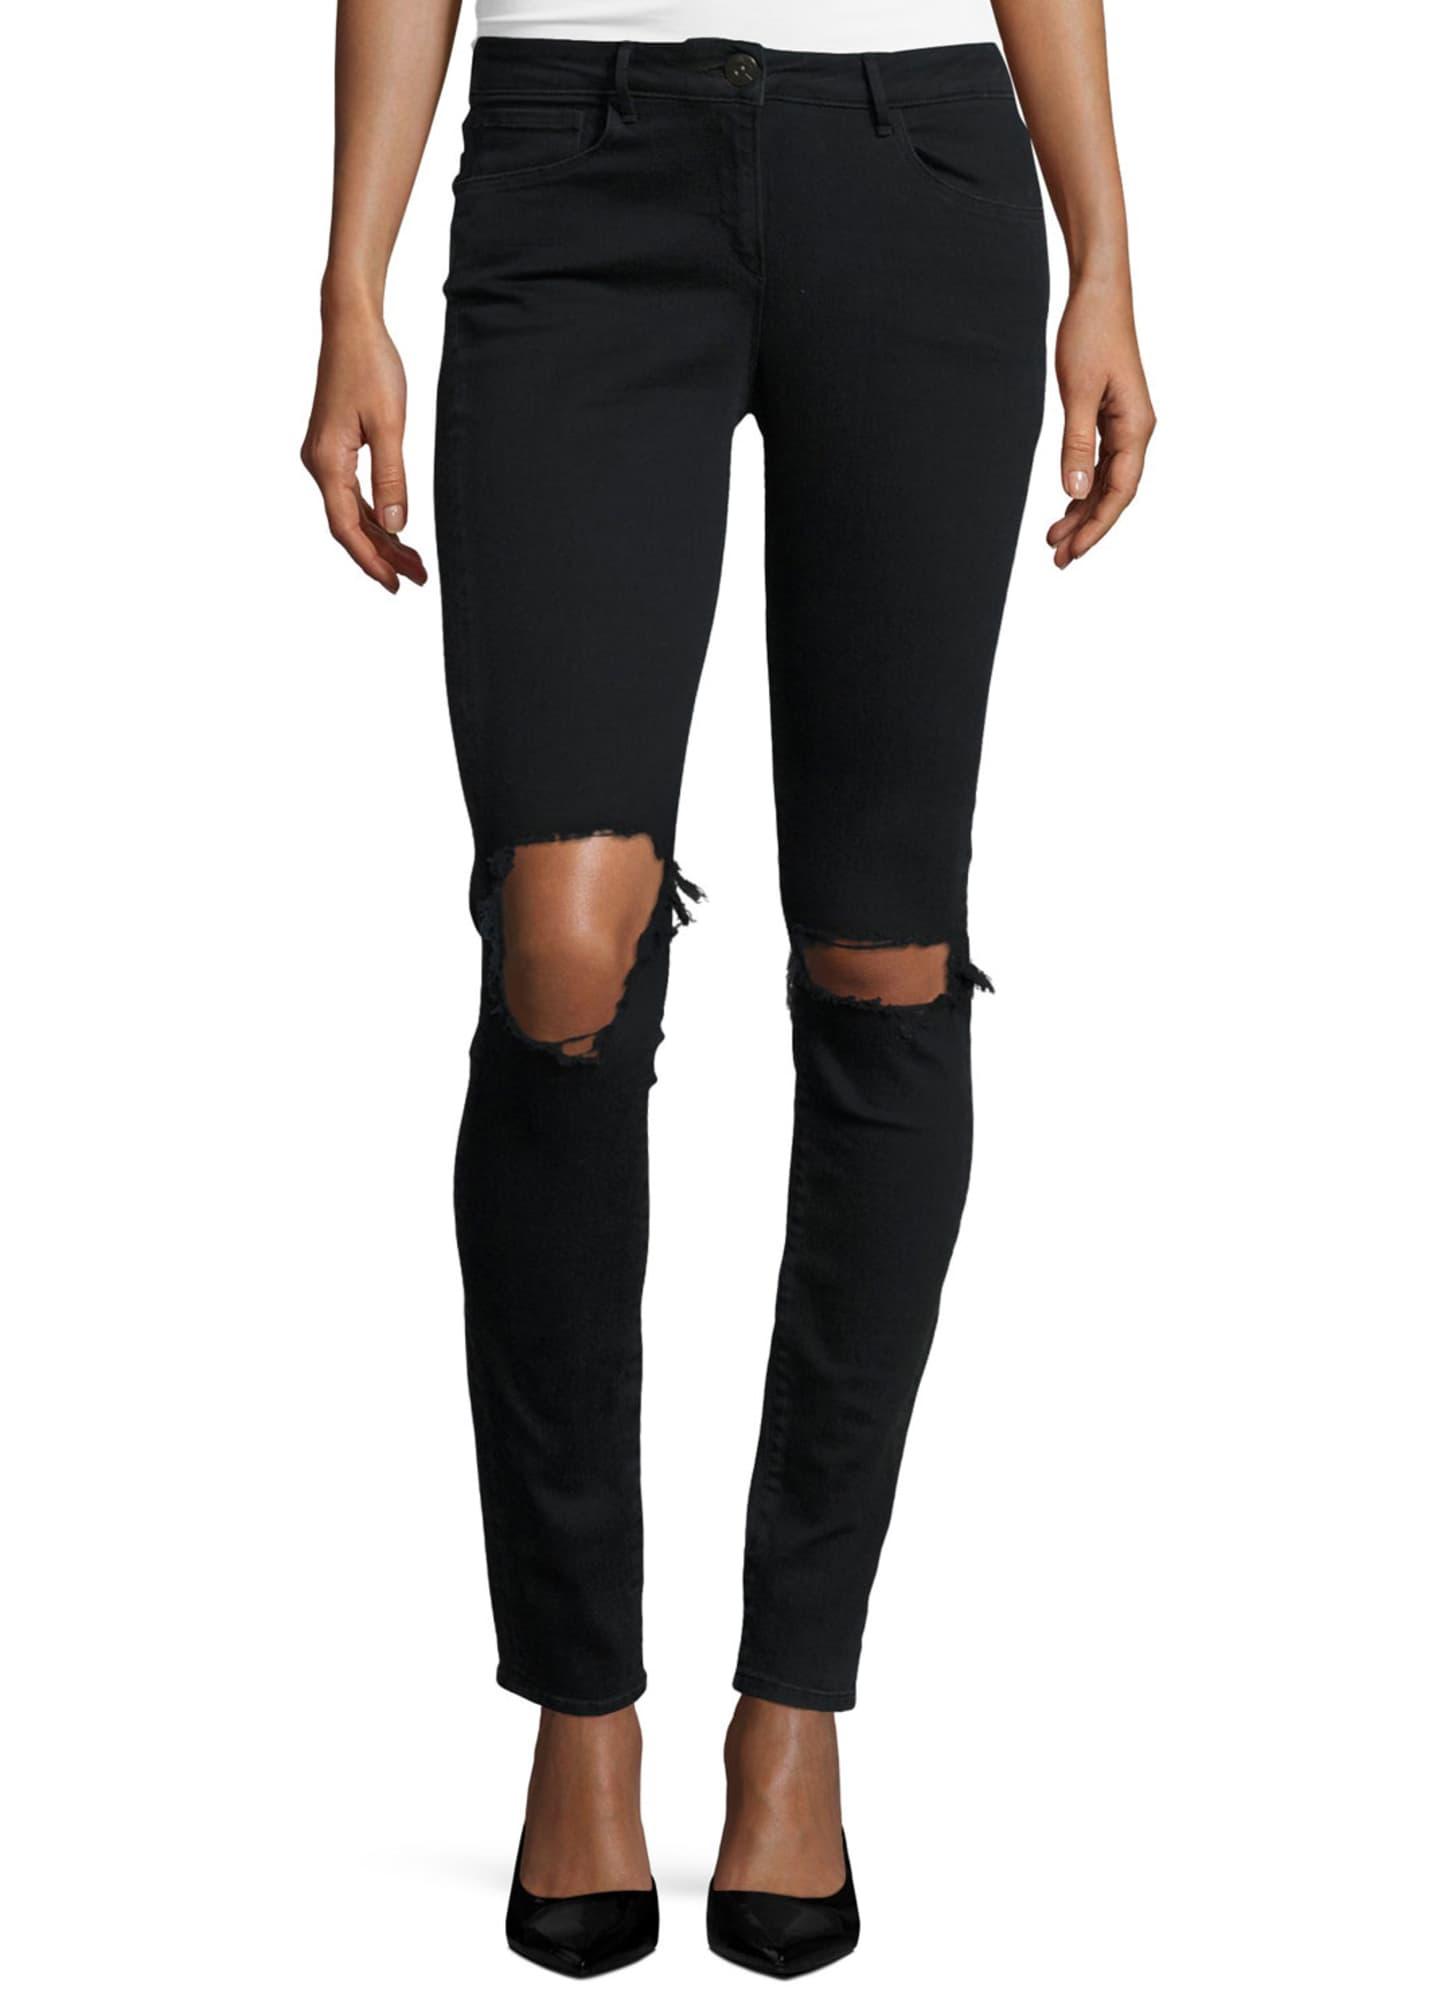 3x1 W2 Mid-Rise Distressed Skinny Jeans, Black Fade